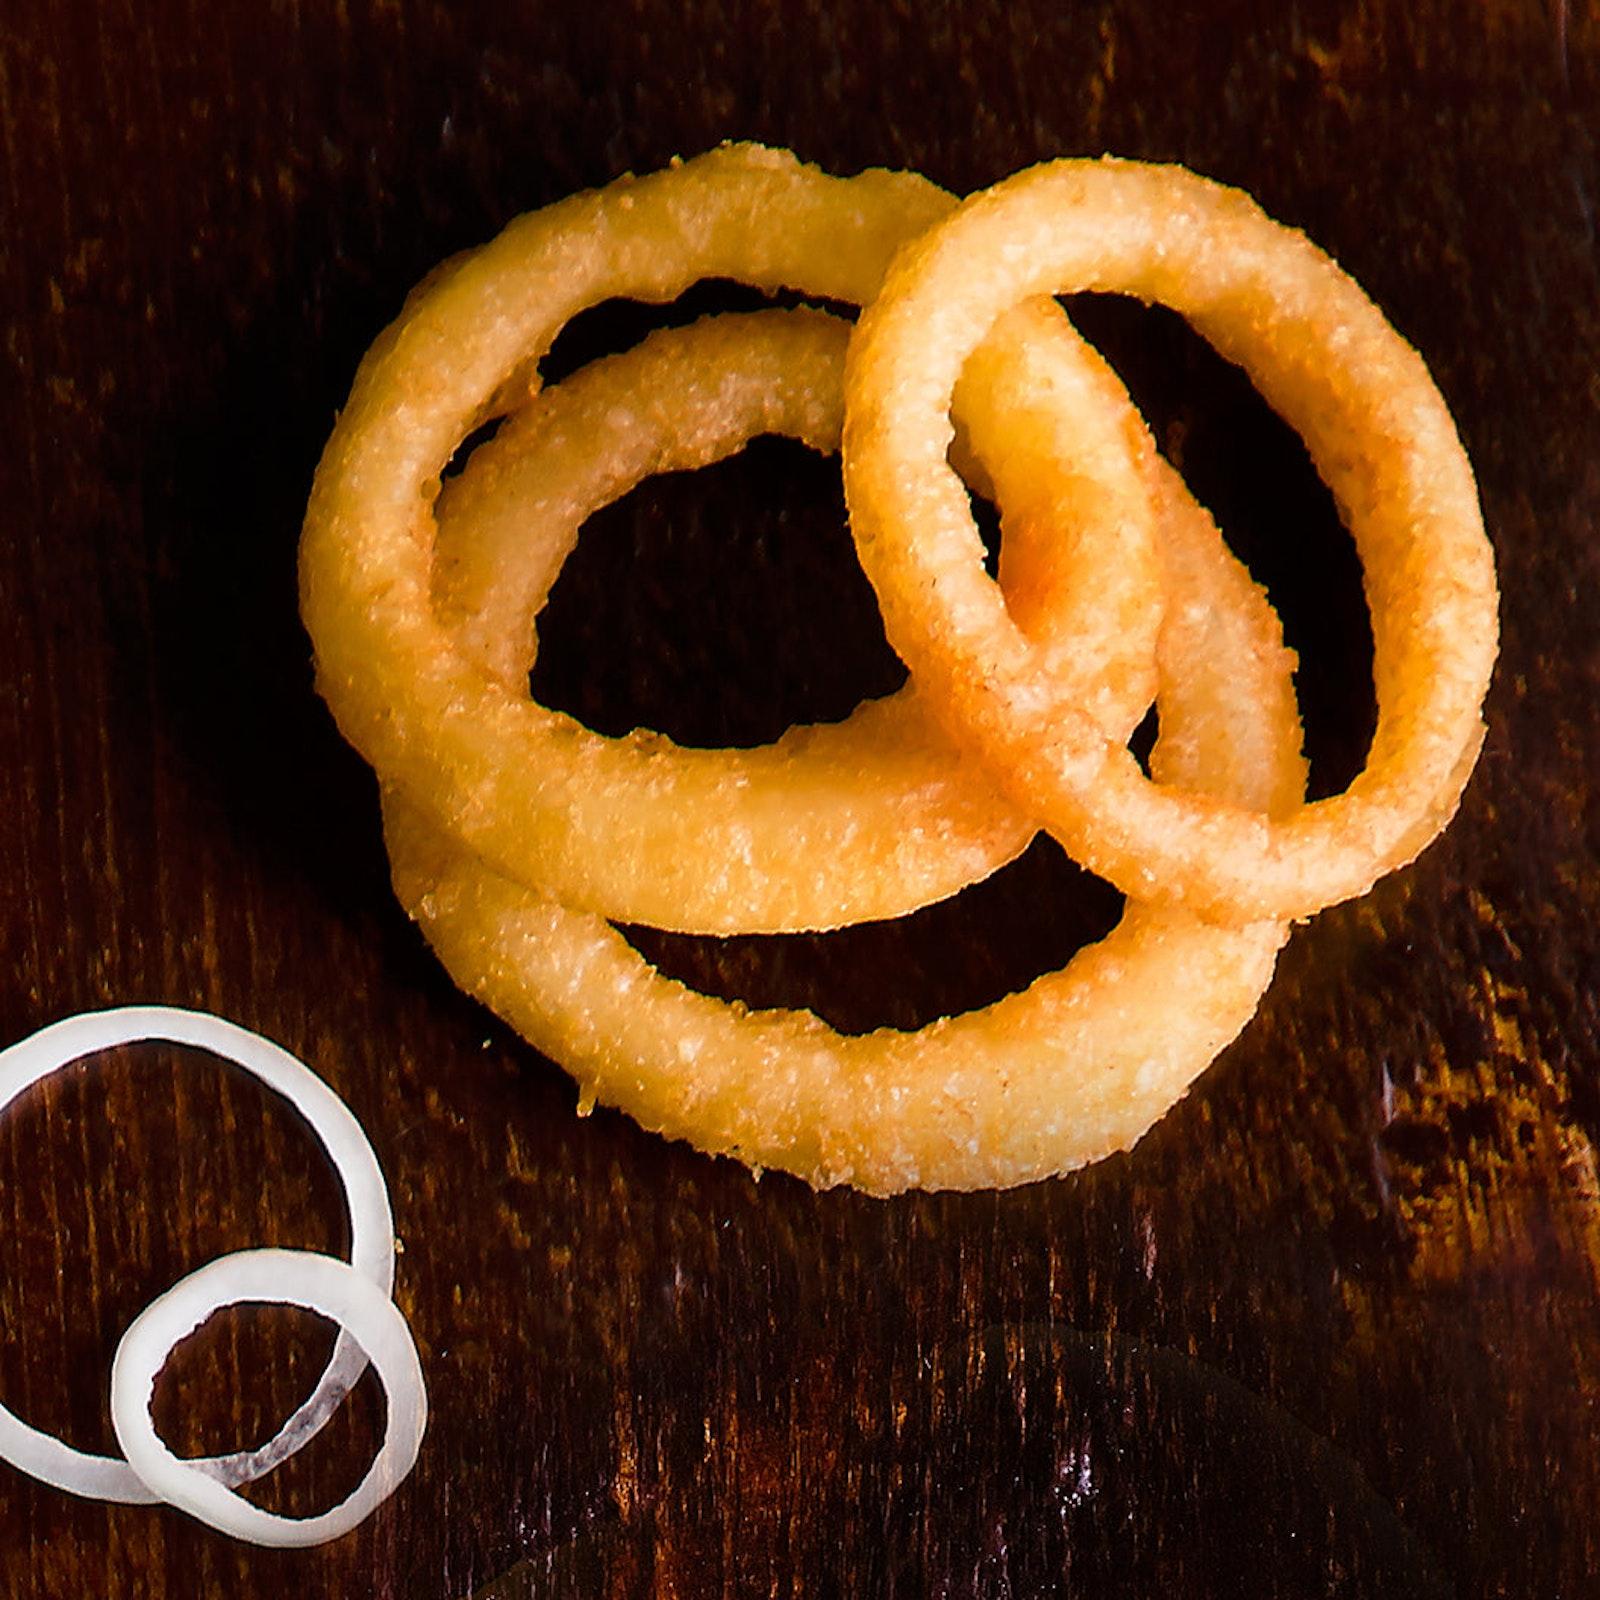 McCain Battered Onion Rings